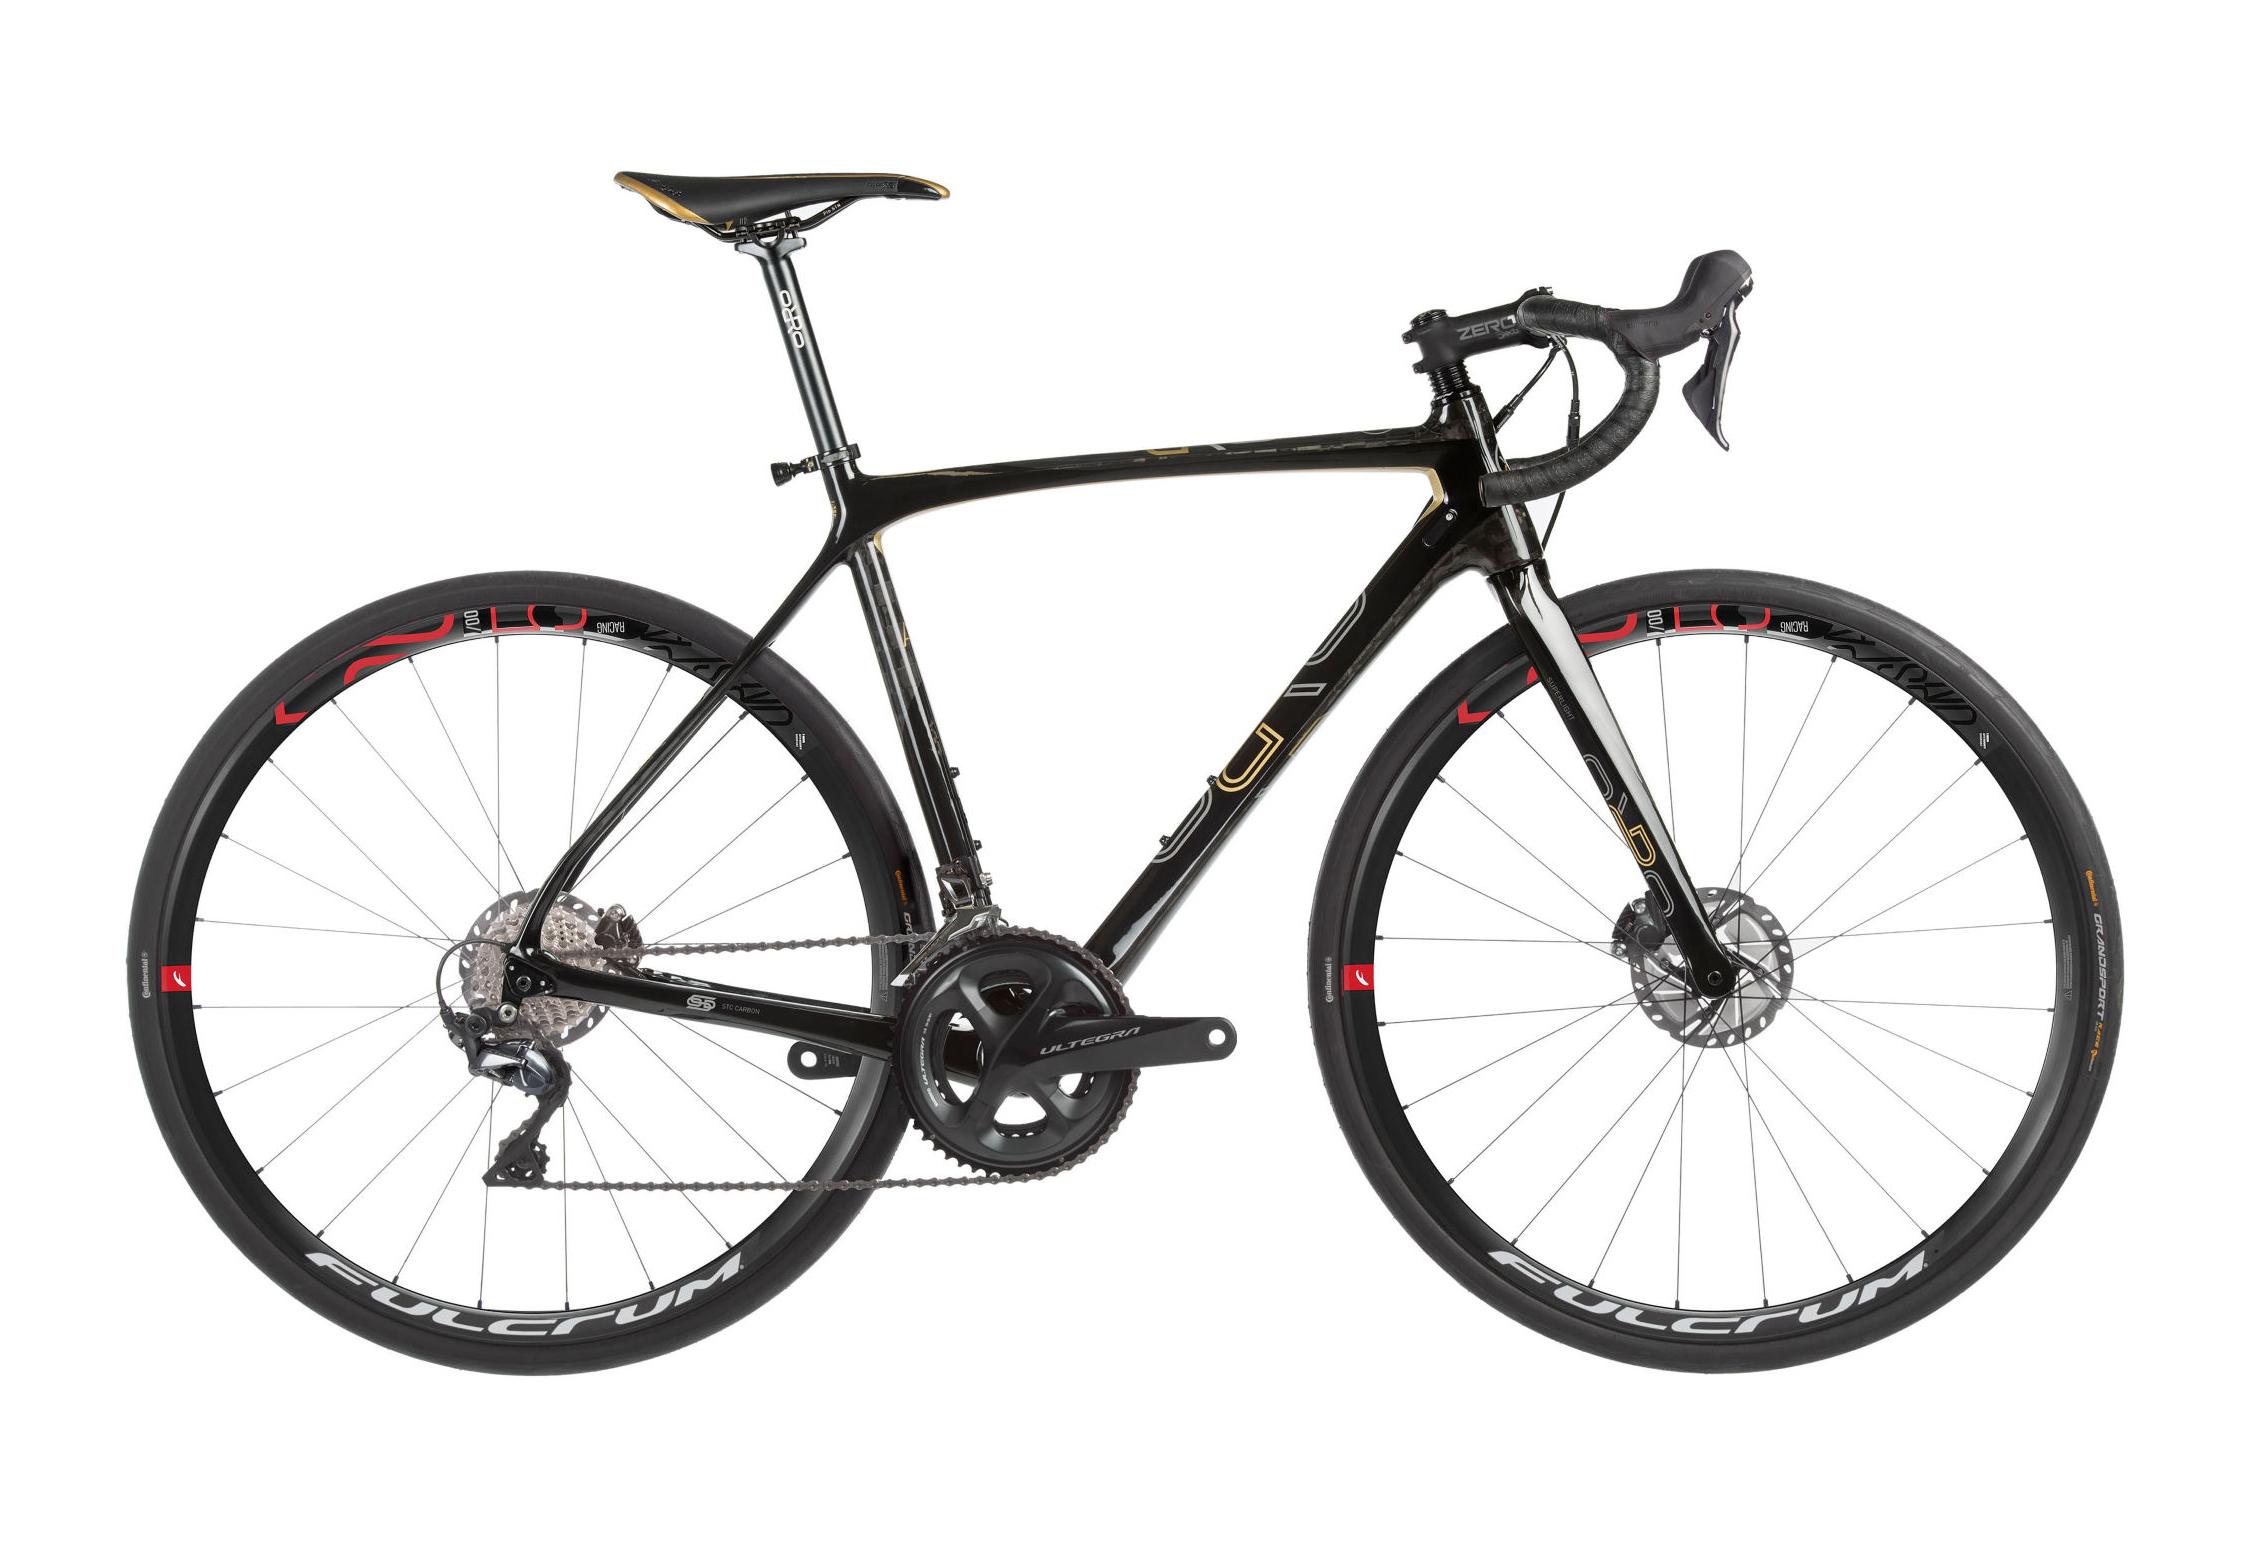 17 Reasons To Not To Buy Orro Gold Stc Jun 2020 Bikeride